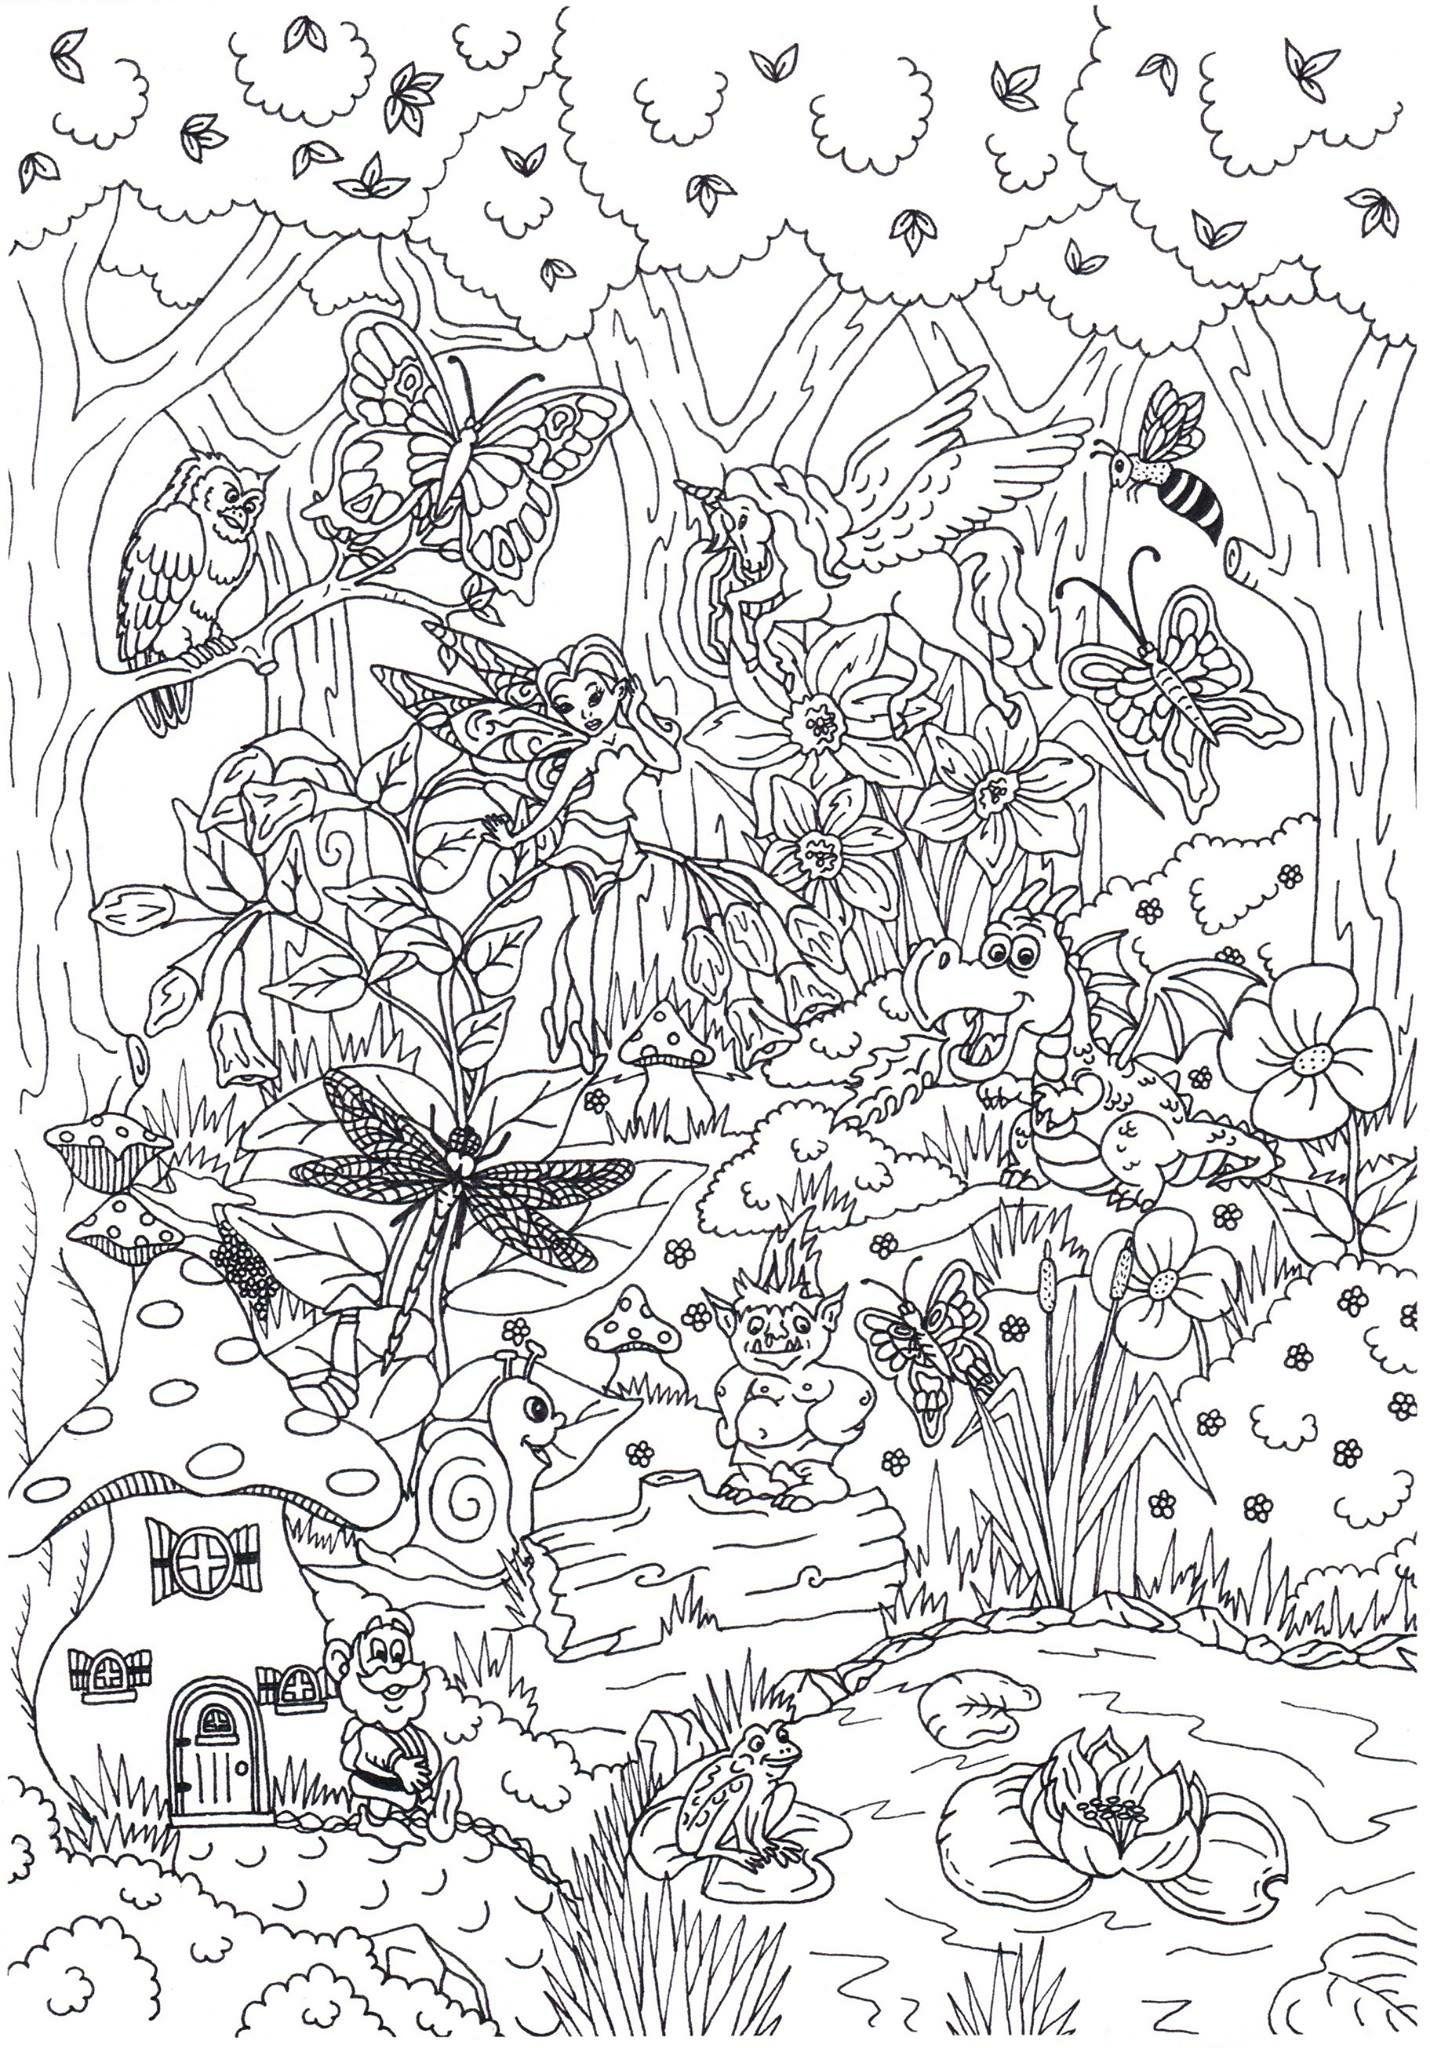 Pin By Wendy Brown On Kleurplaten Fairy Coloring Pages Cute Coloring Pages Fairy Coloring